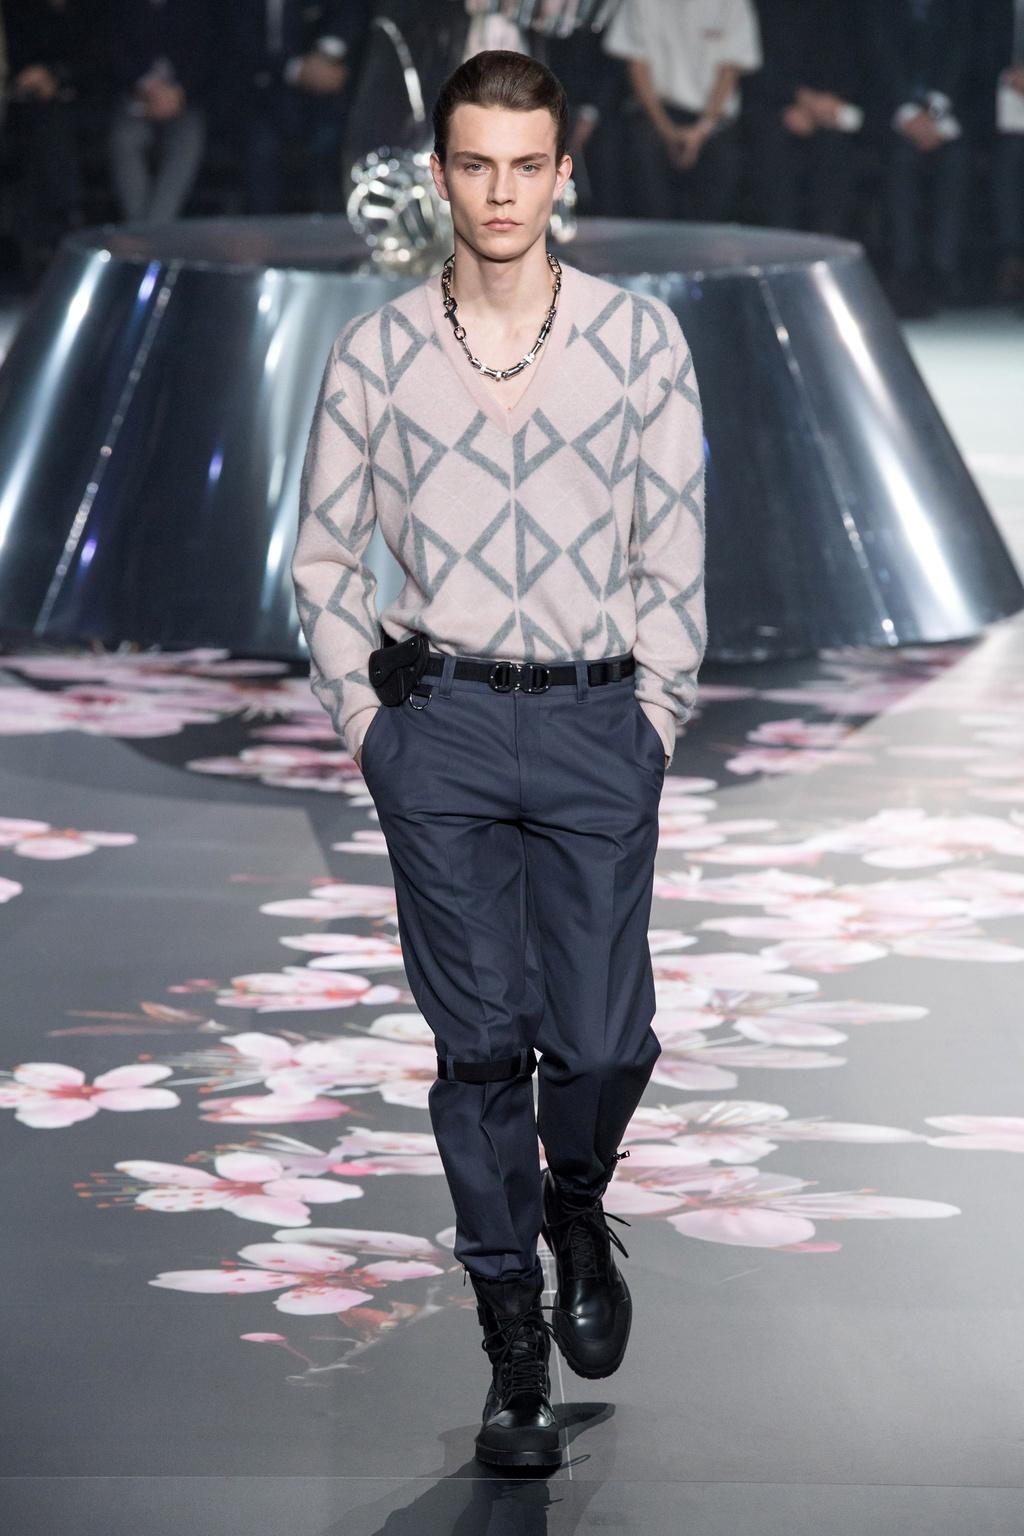 Show dien Dior gay sot voi phu kien giong bao dung sung hinh anh 6